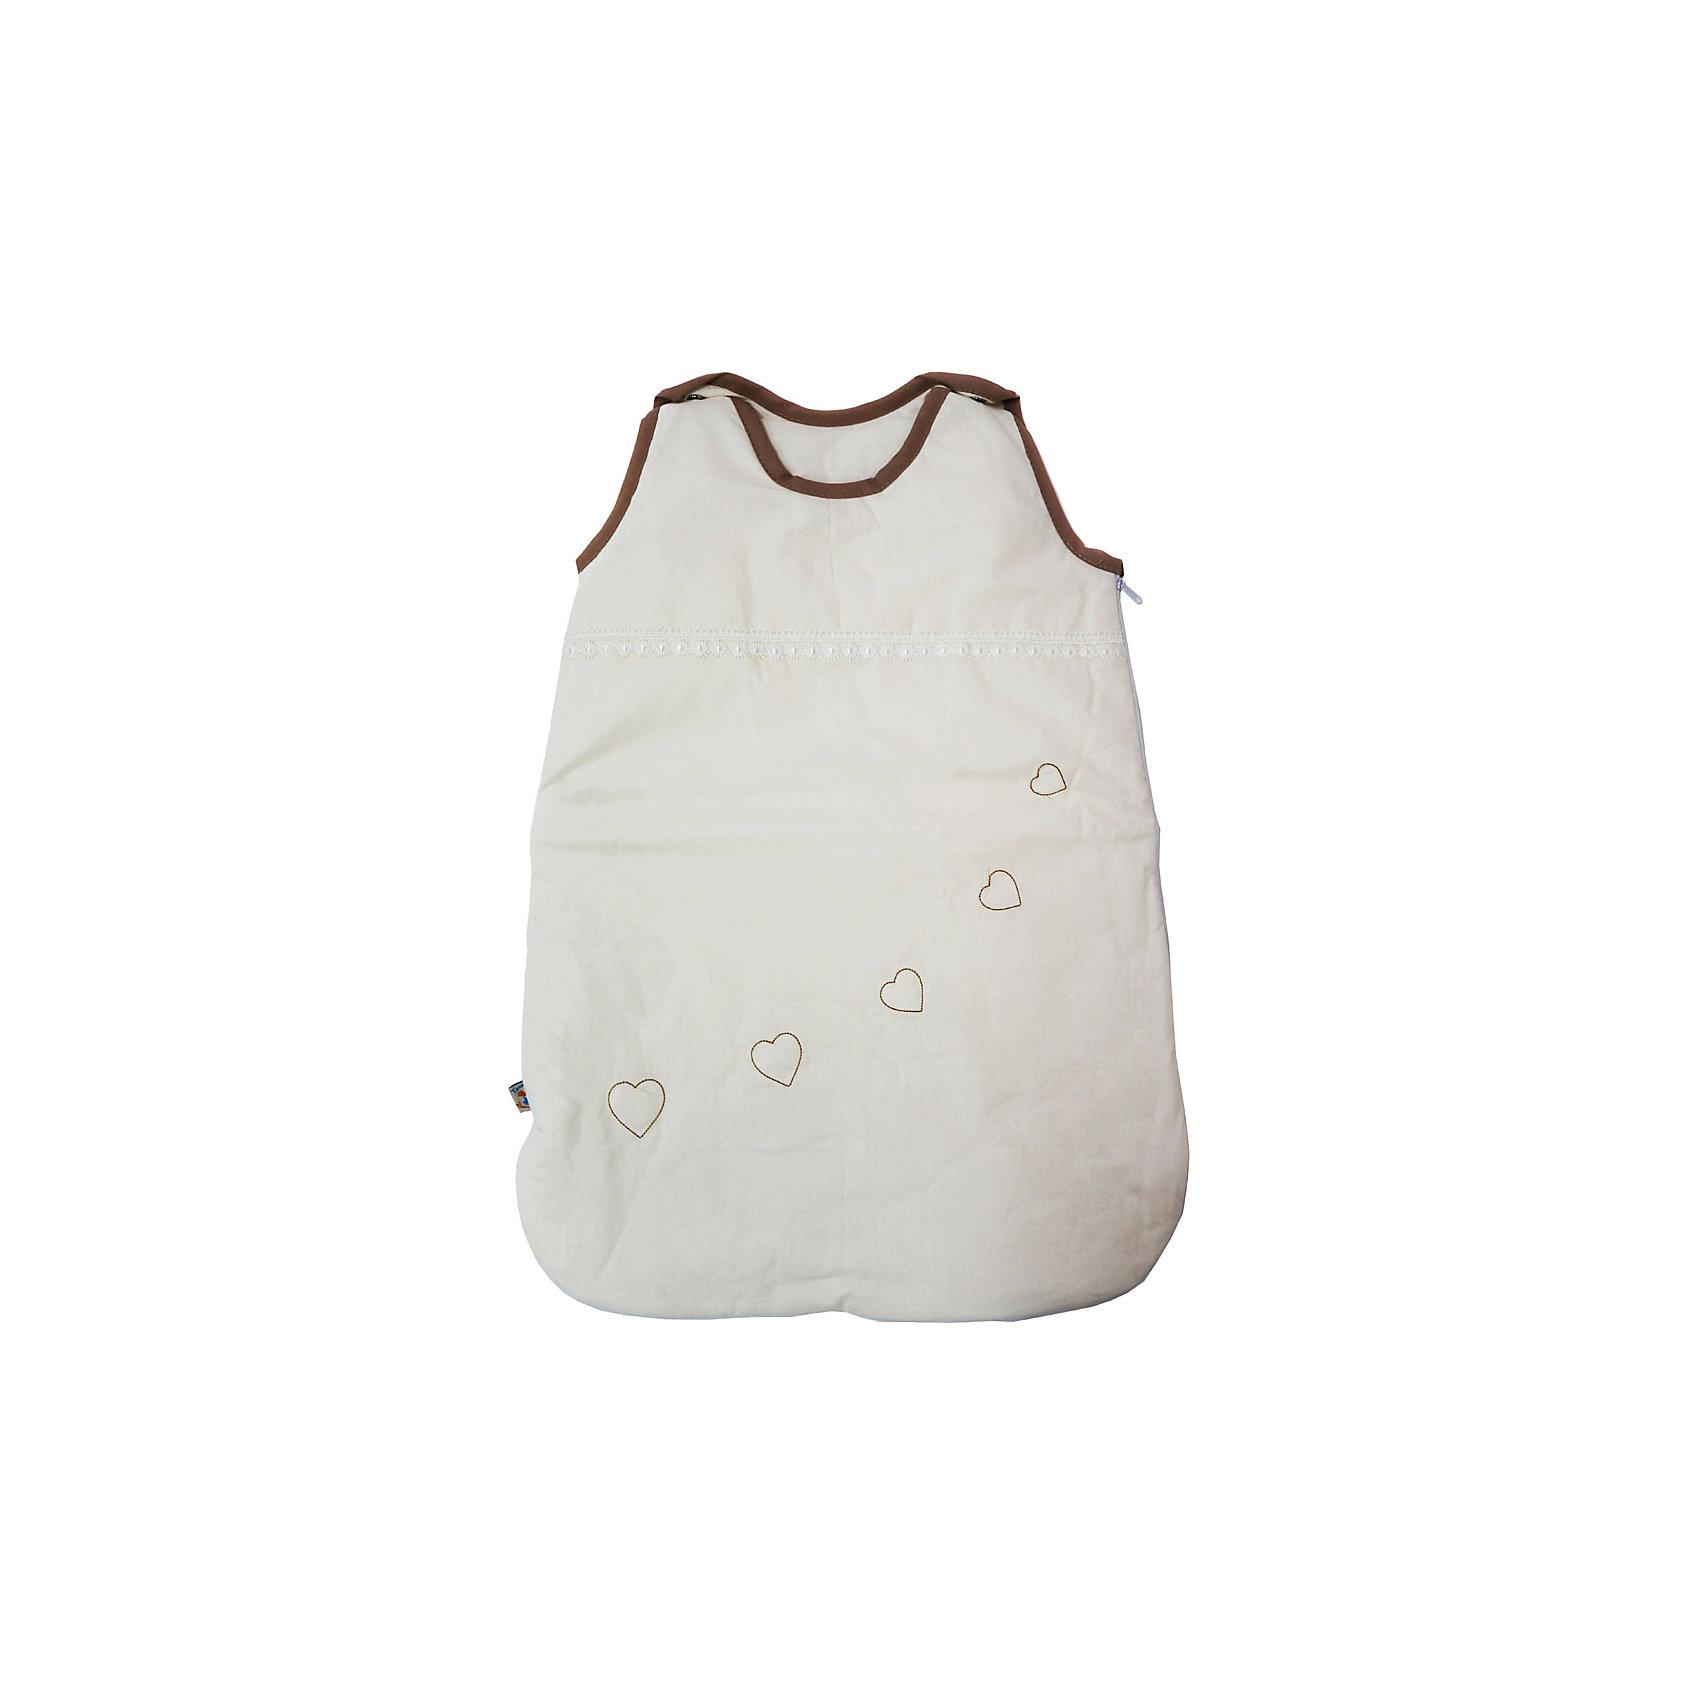 Топотушки Мешок для сна Аморе Мио, Топотушки одежда для сна